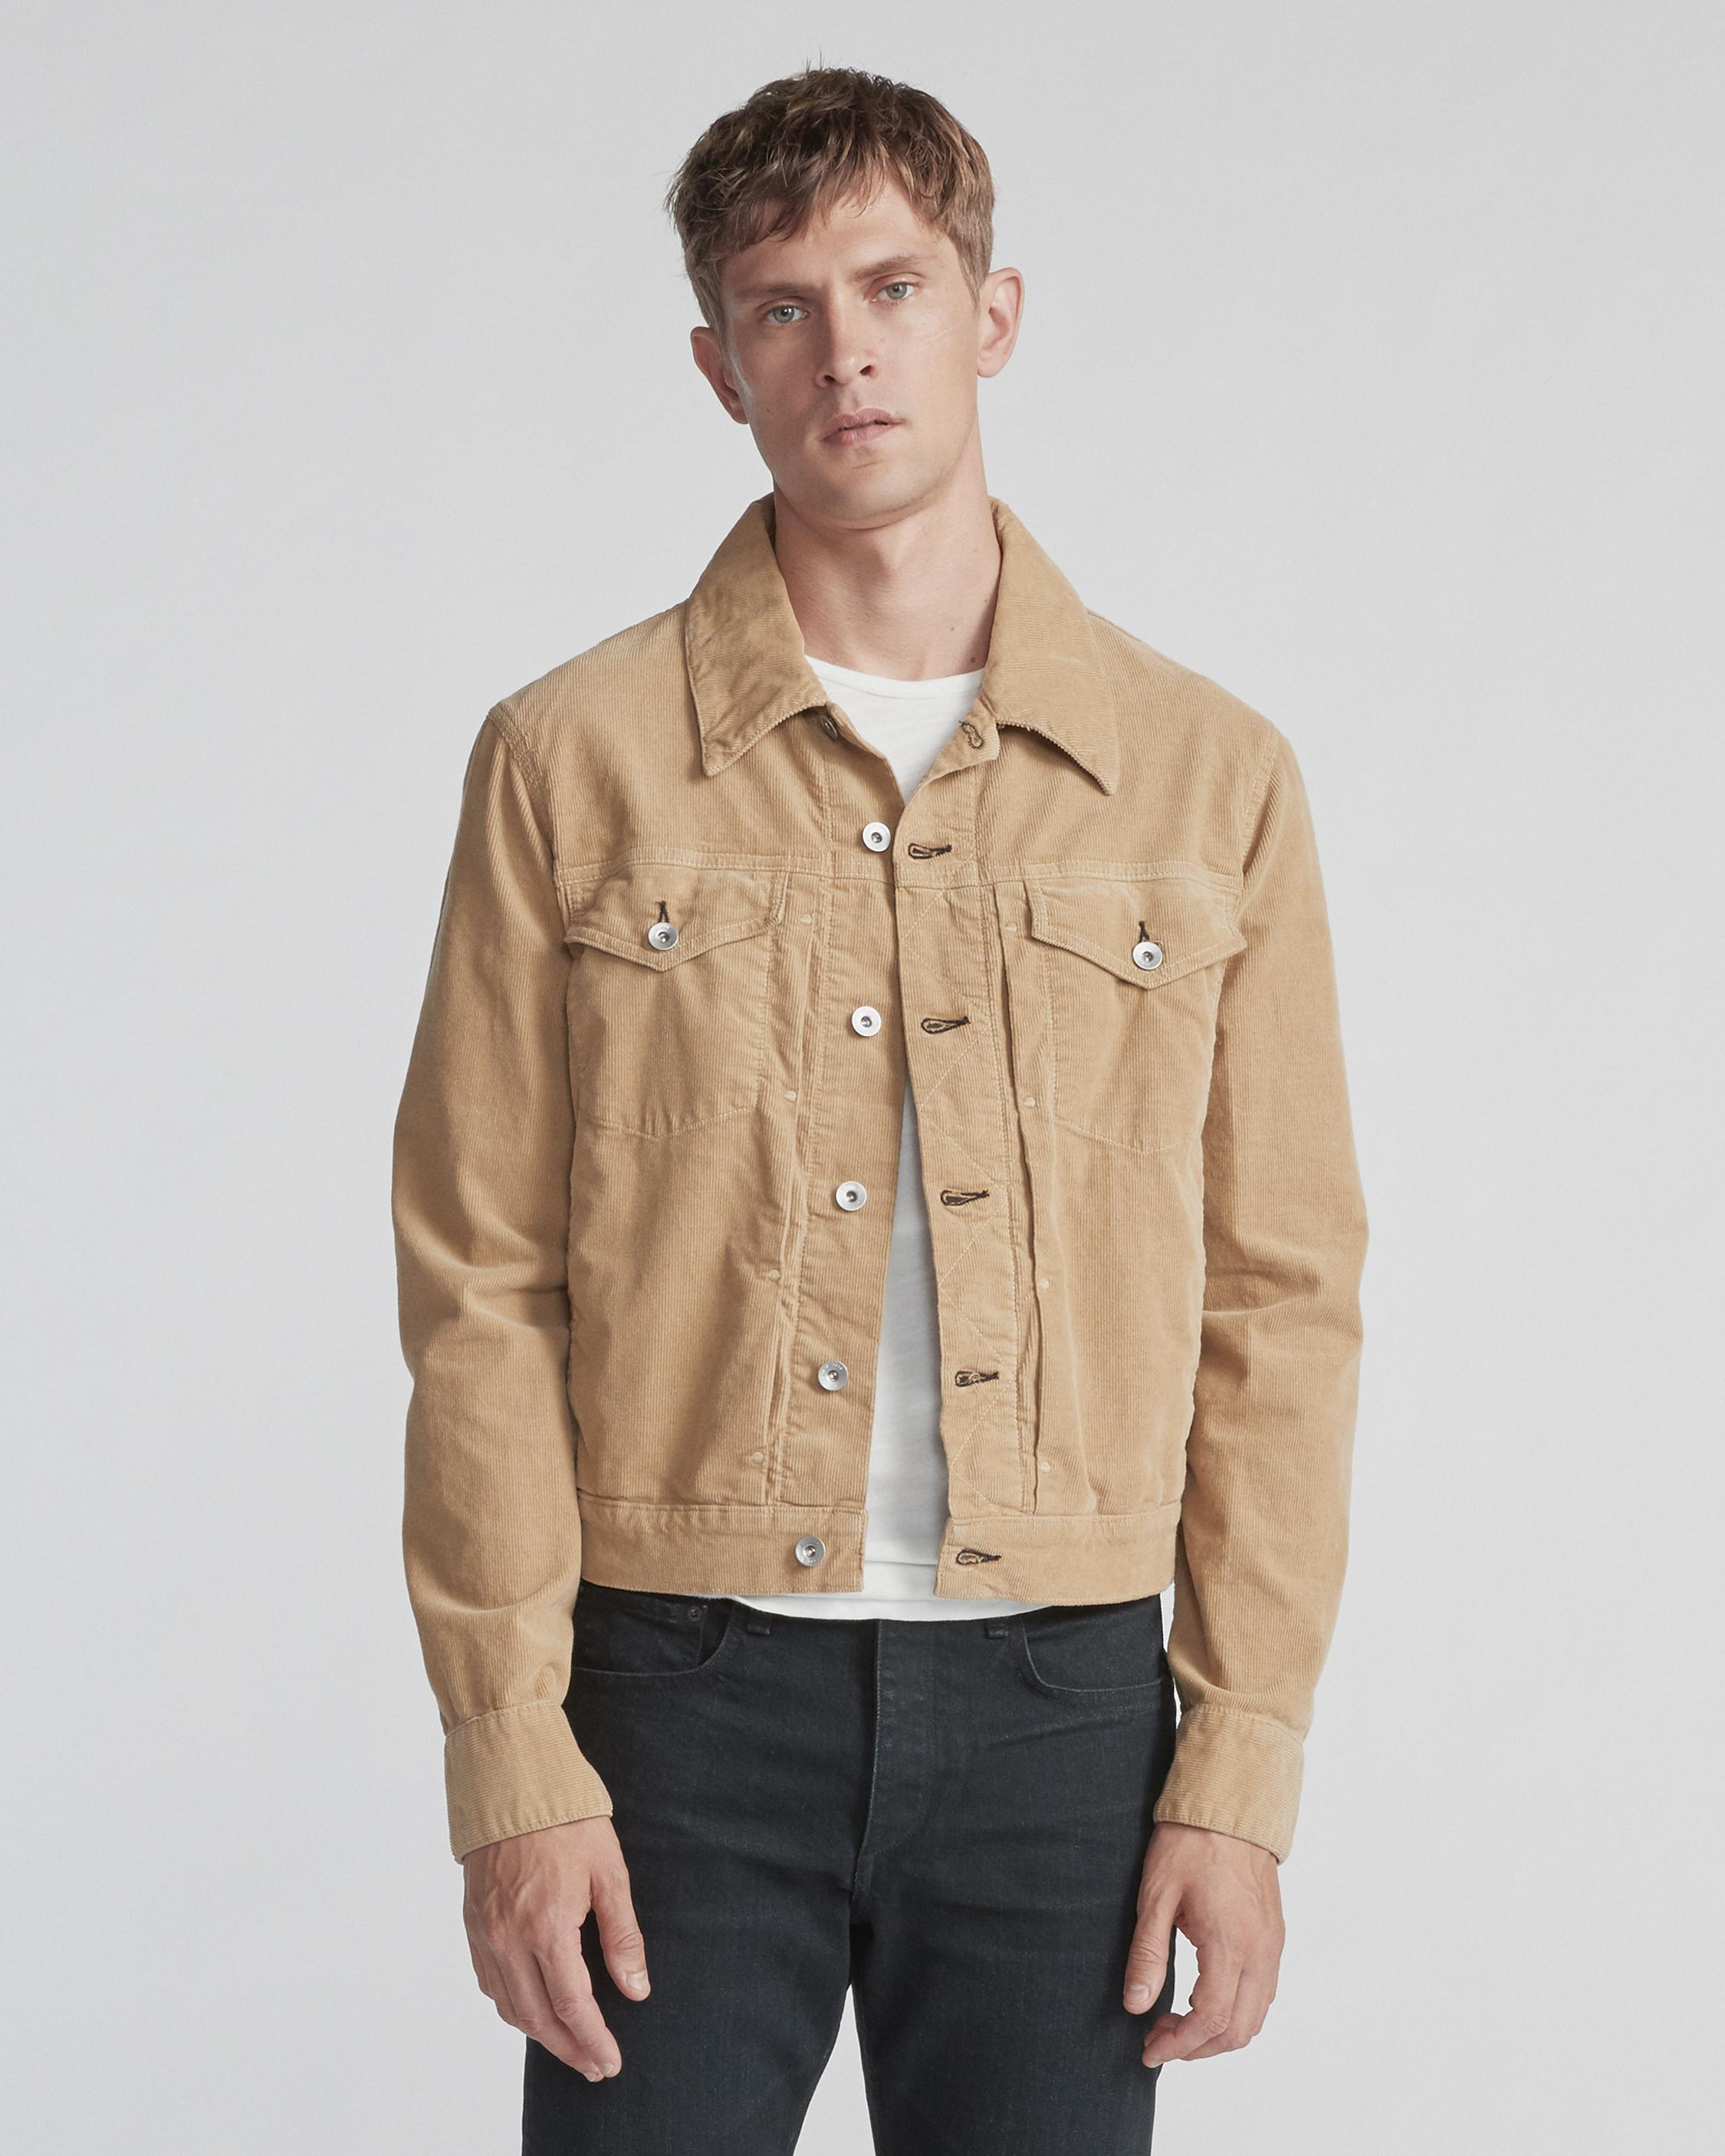 395c01a4471c8 Definitive Jean Jacket